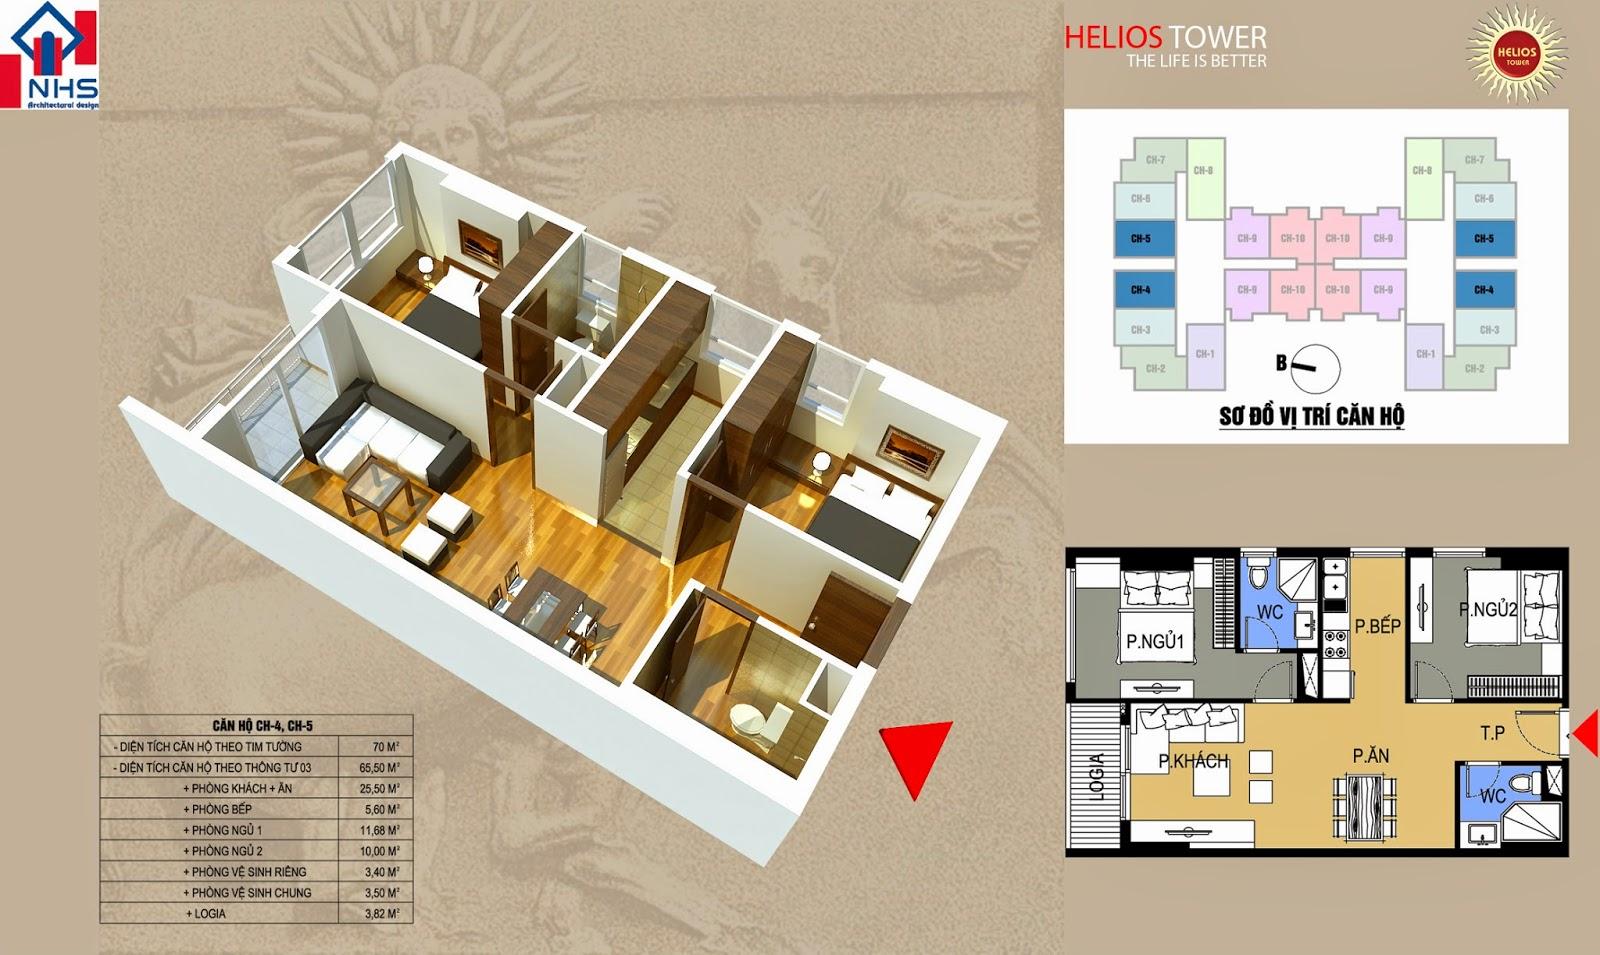 Căn 04 05 Helios Tower 75 Tam Trinh